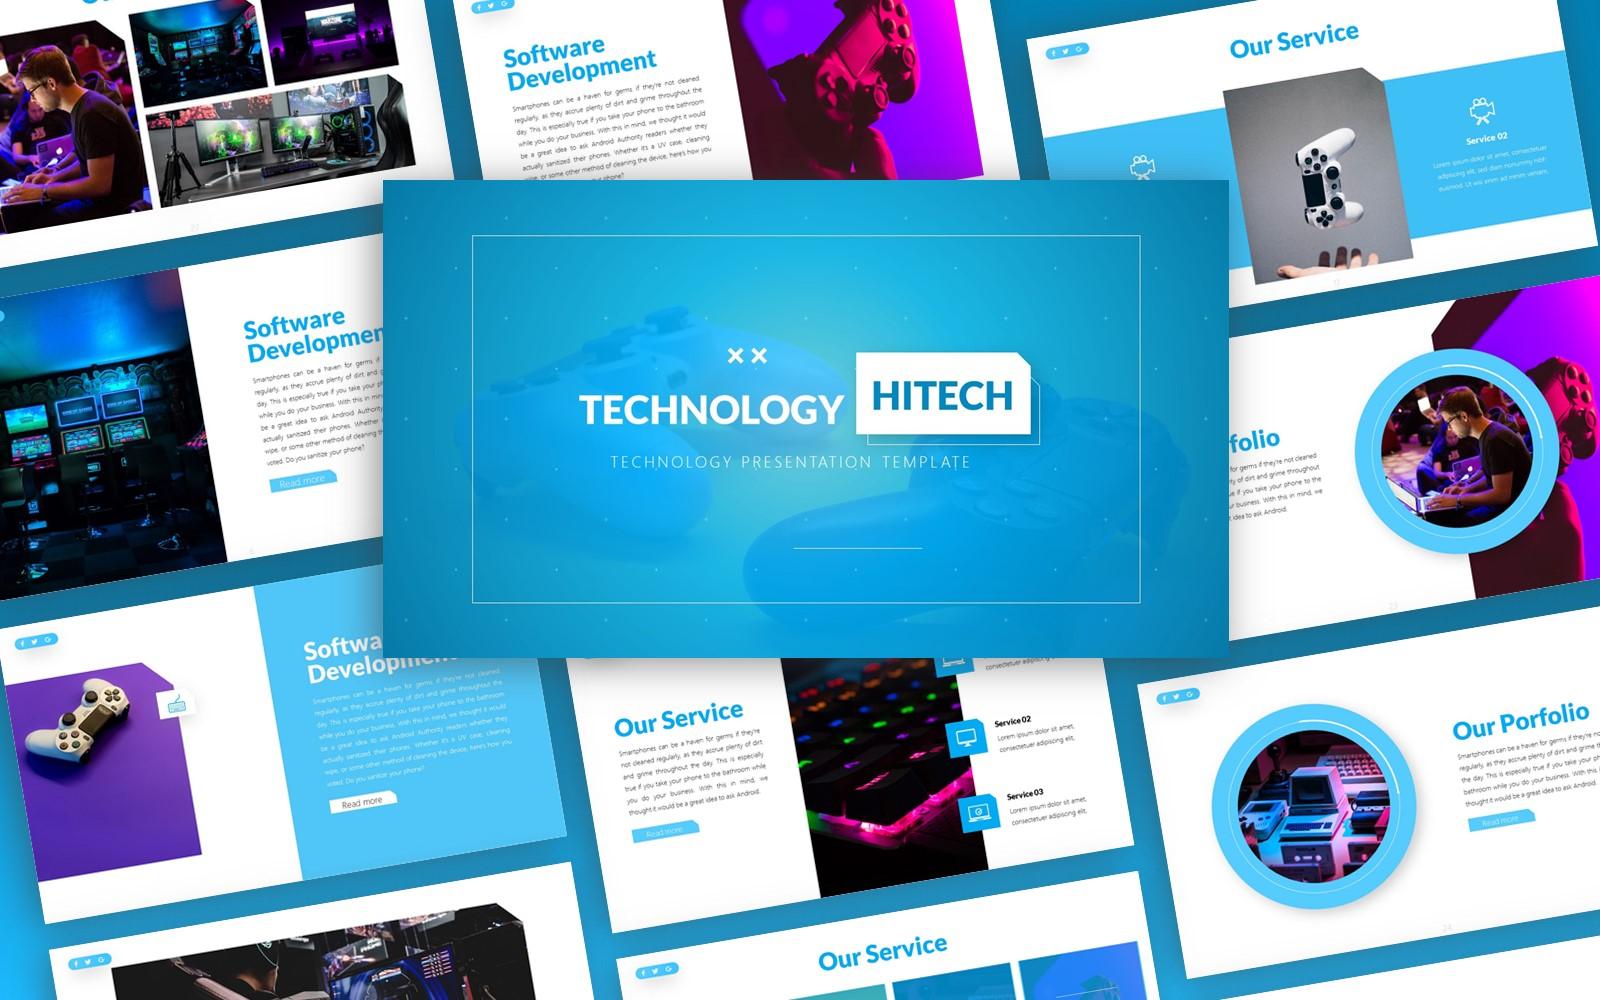 Hitech - Technologie Multifunctionele Sjablonen PowerPoint presentatie